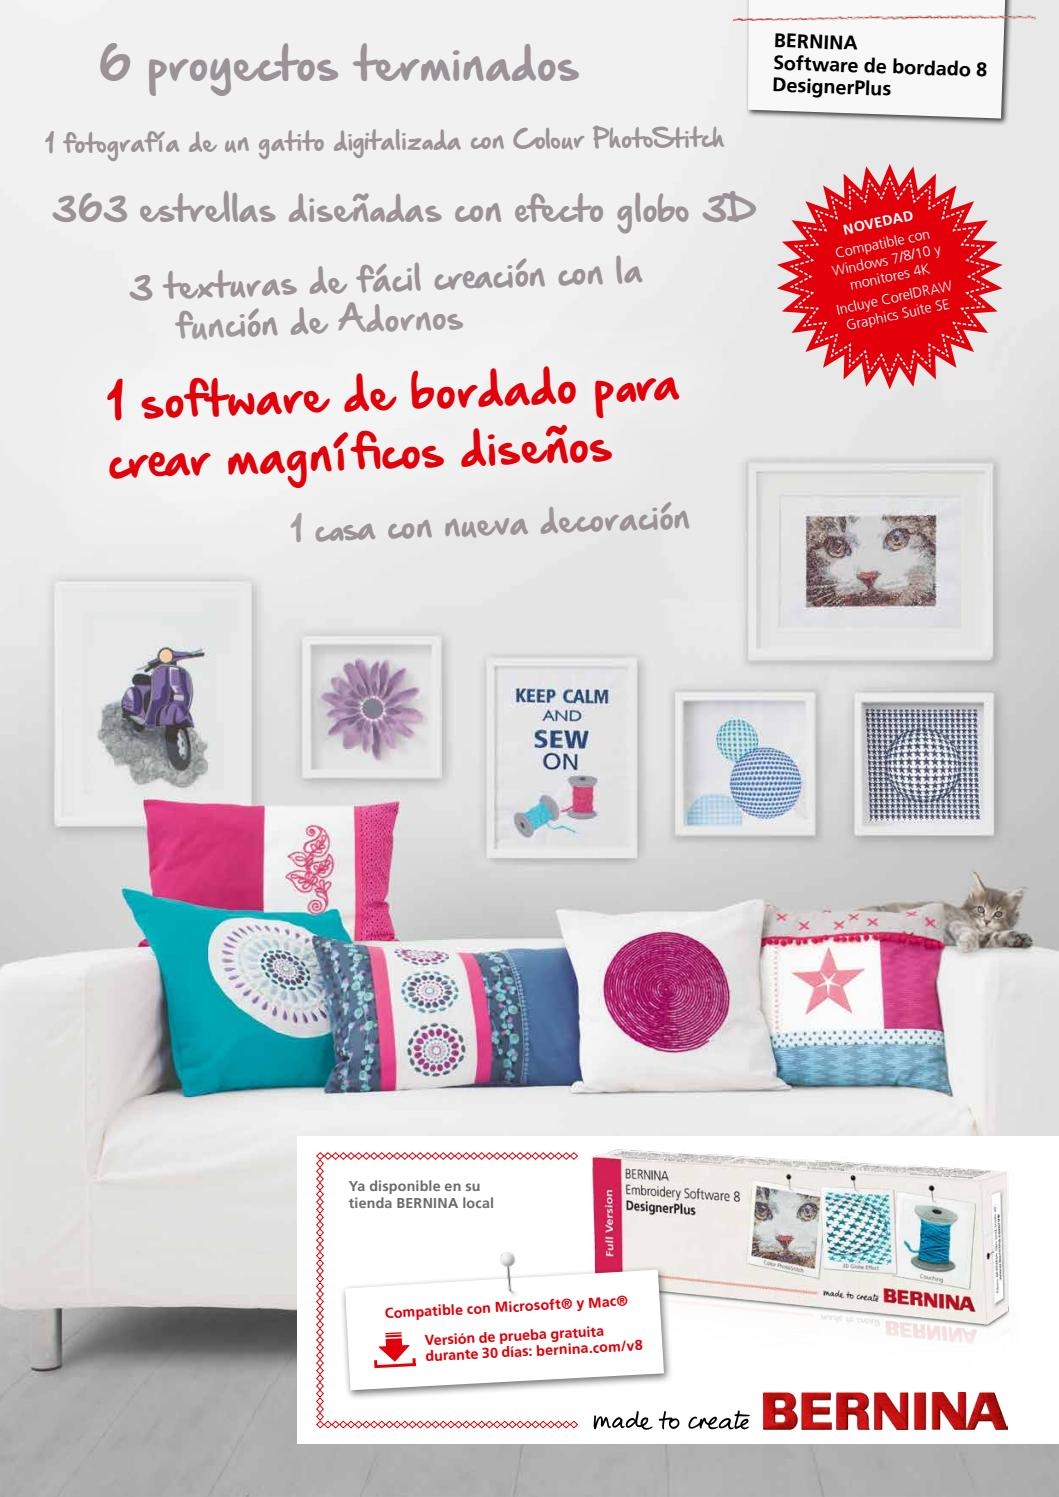 BERNINA Embroidery Software 8 brochure Spanish by Bernina ...